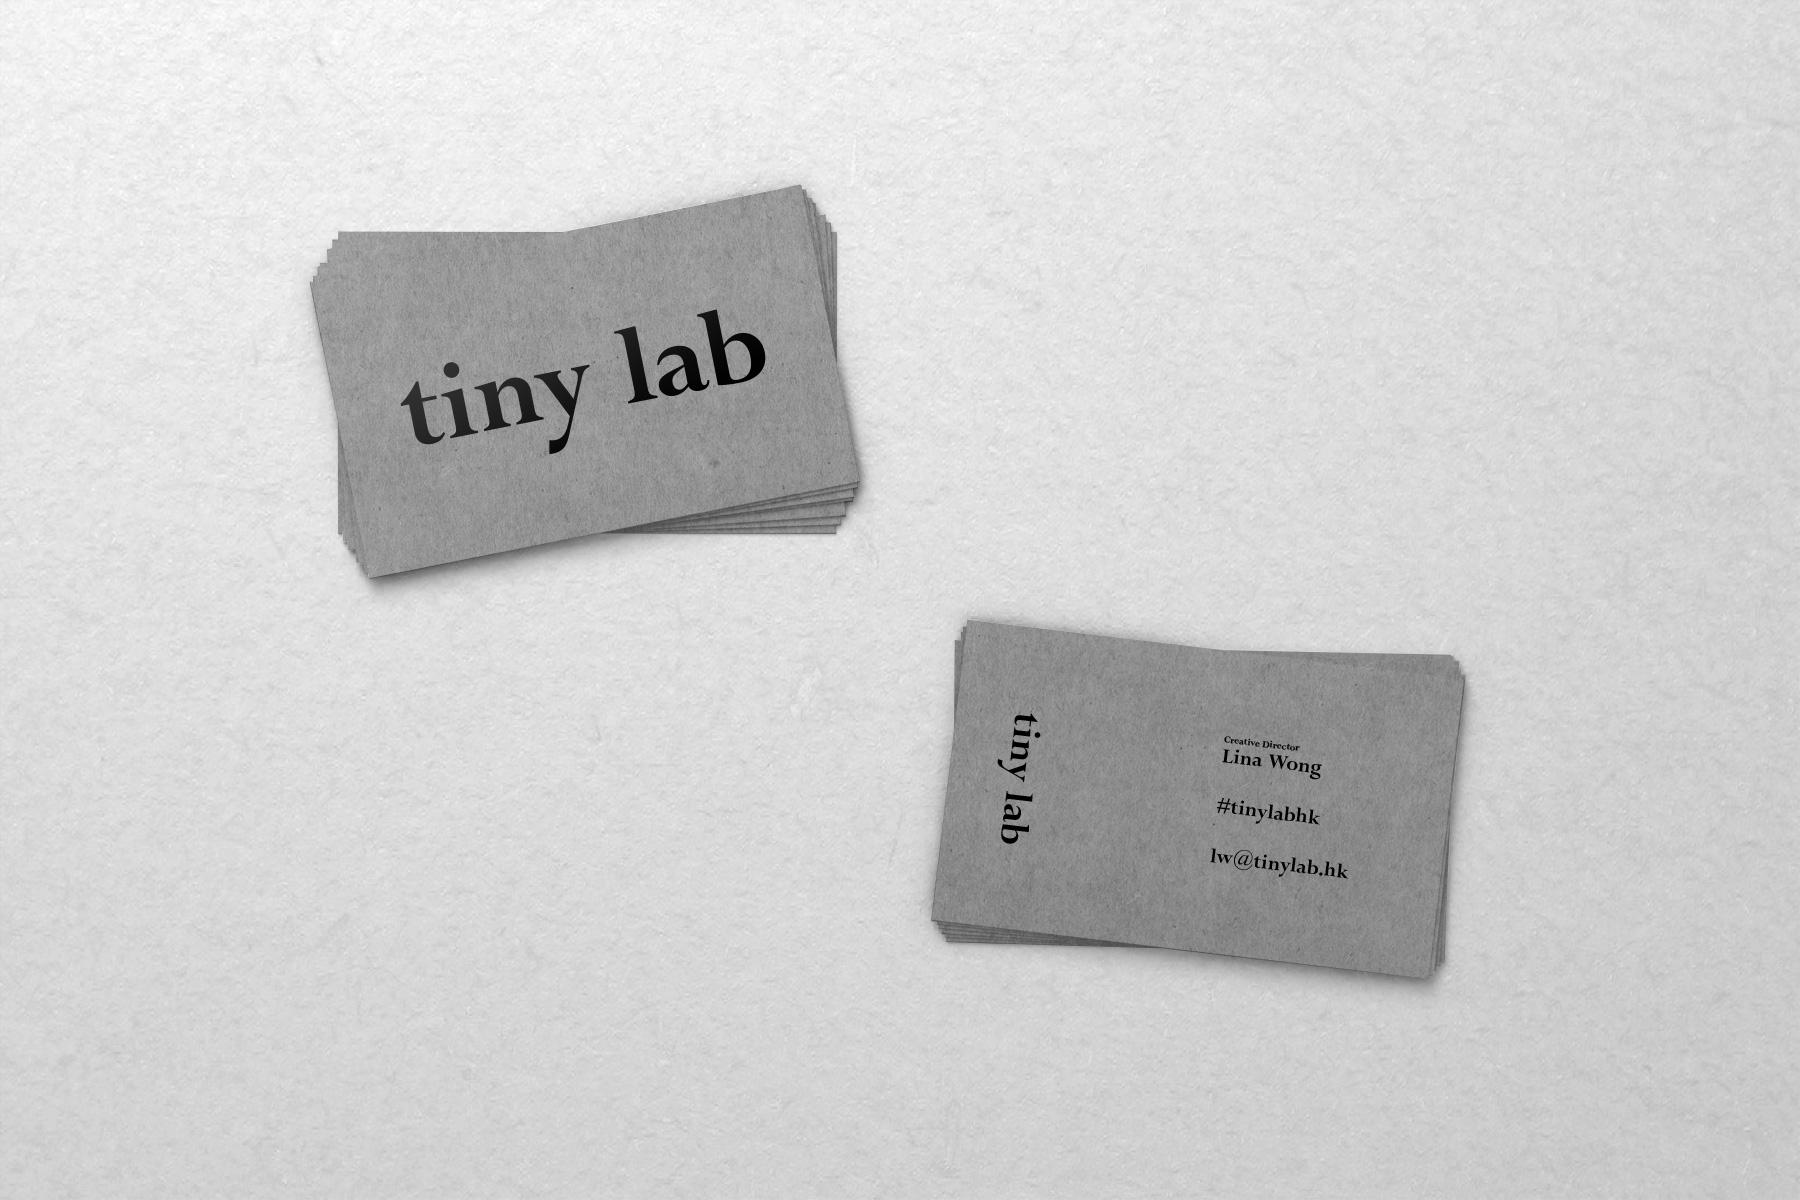 tinylab-01